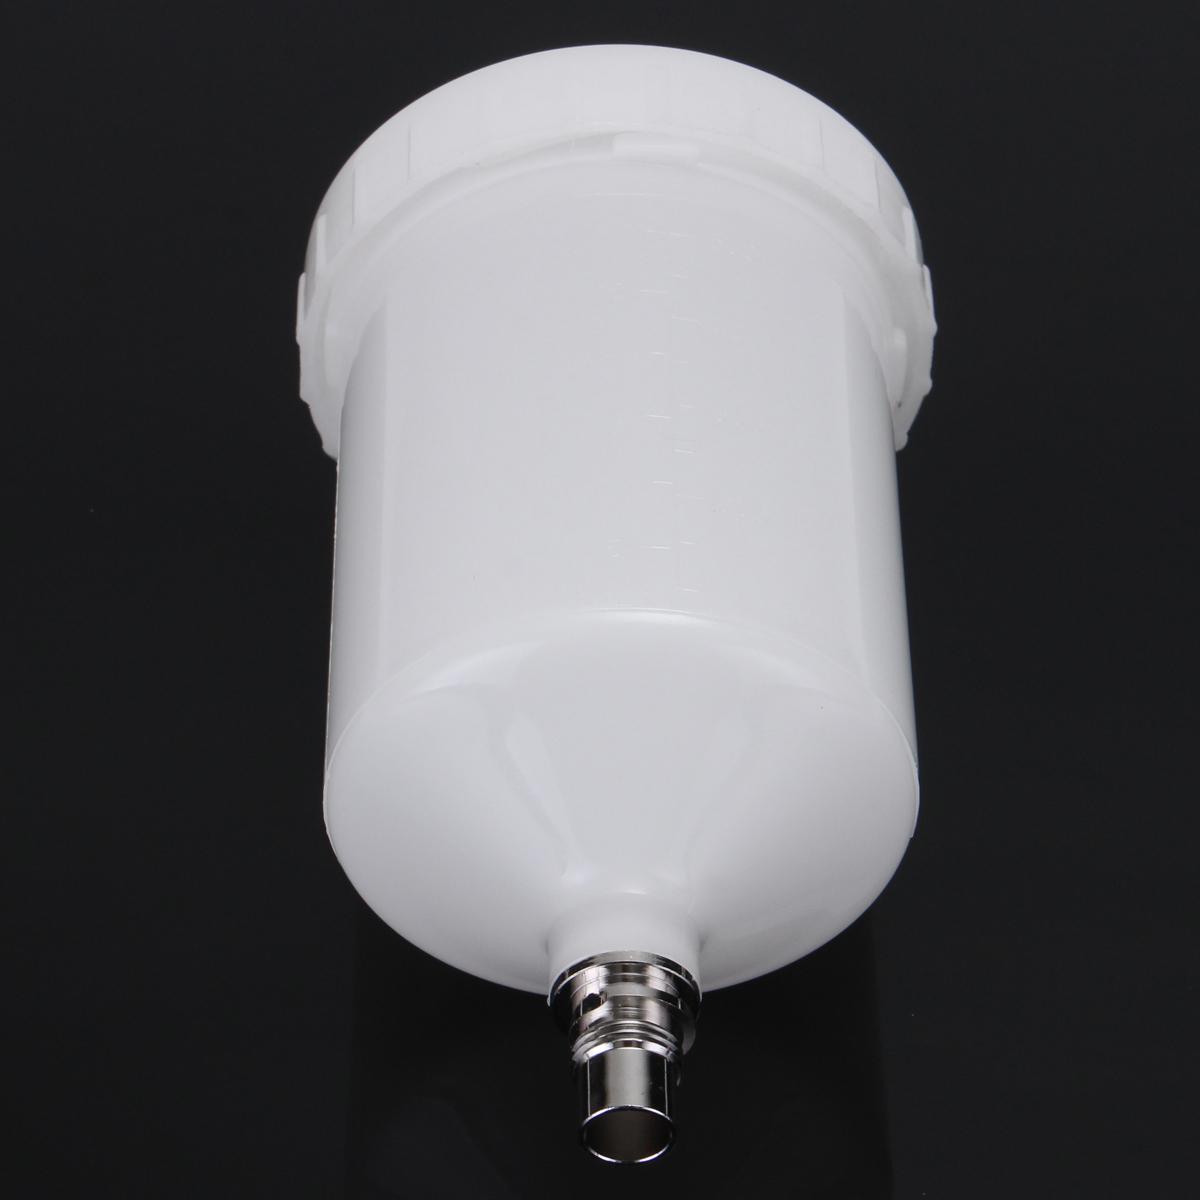 600mL Plastic Spray Gun Cup Pot White QCC Connector For SATAjet Replacement